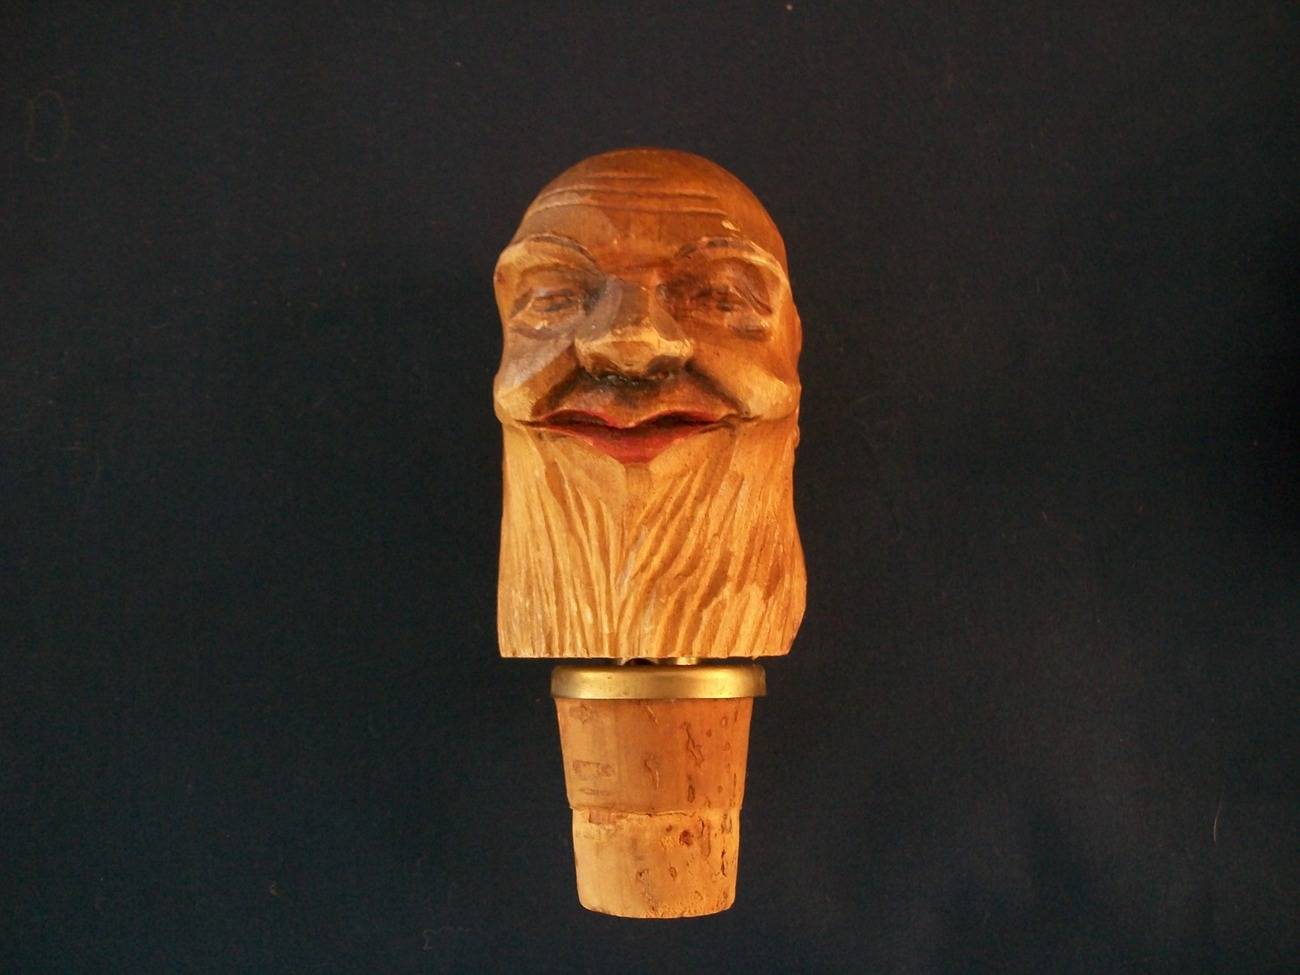 Vintage German Wooden Carved Heads Cork Wine Aerator/Pourers